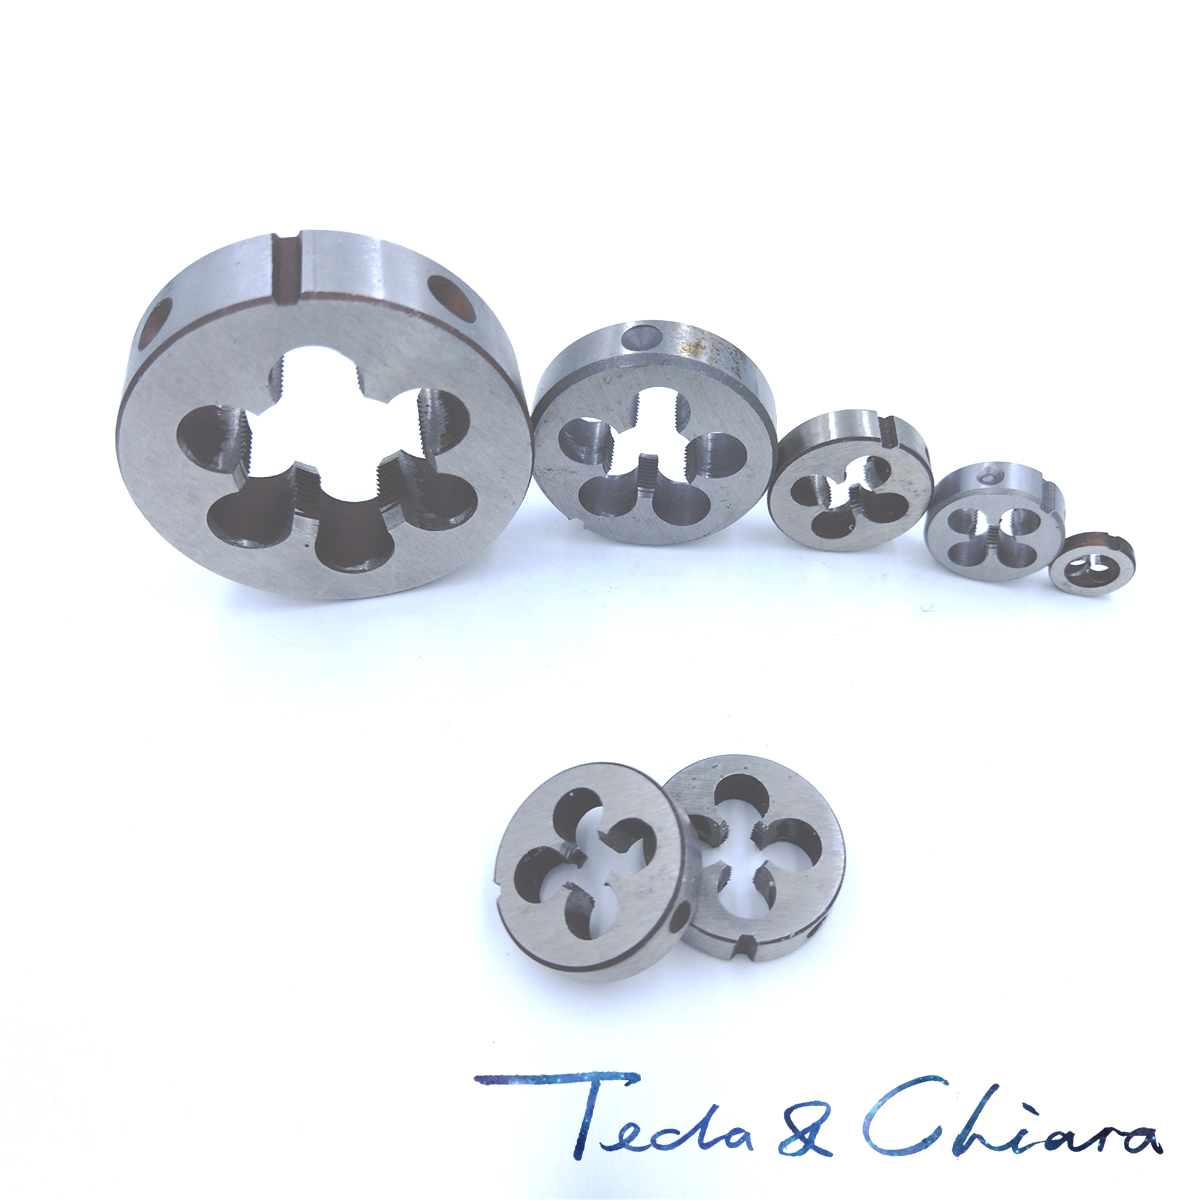 5pcs Machining Tools Thread Die 10mm Alloy Steel M10 x 1 mm Round Dies